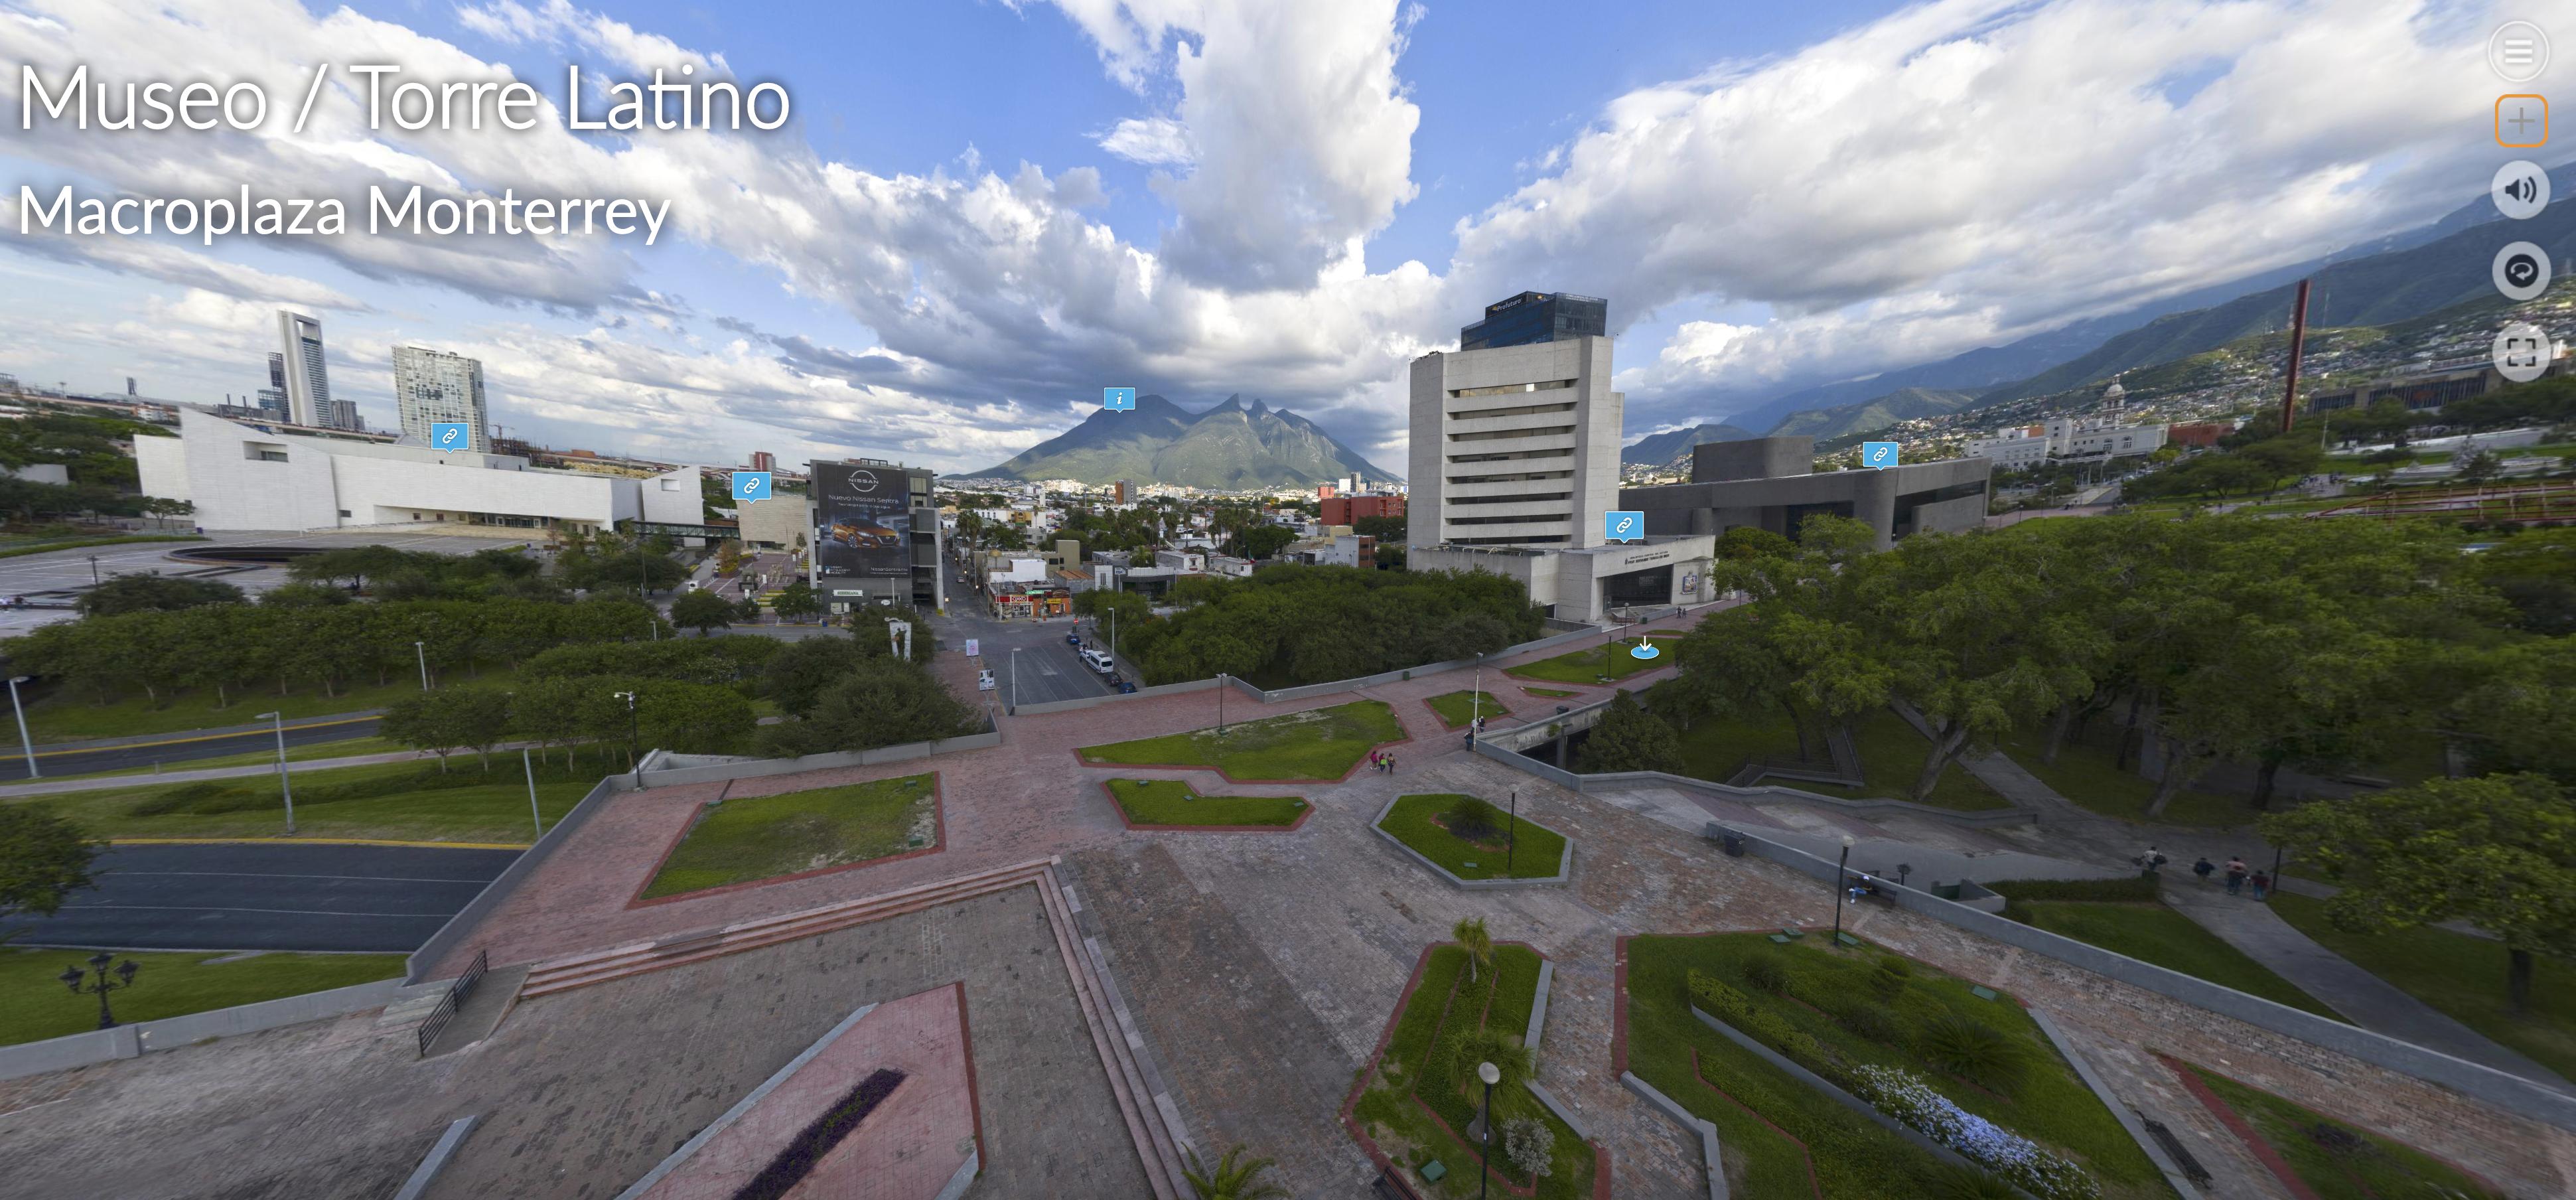 Museo Torre Latino Cerro